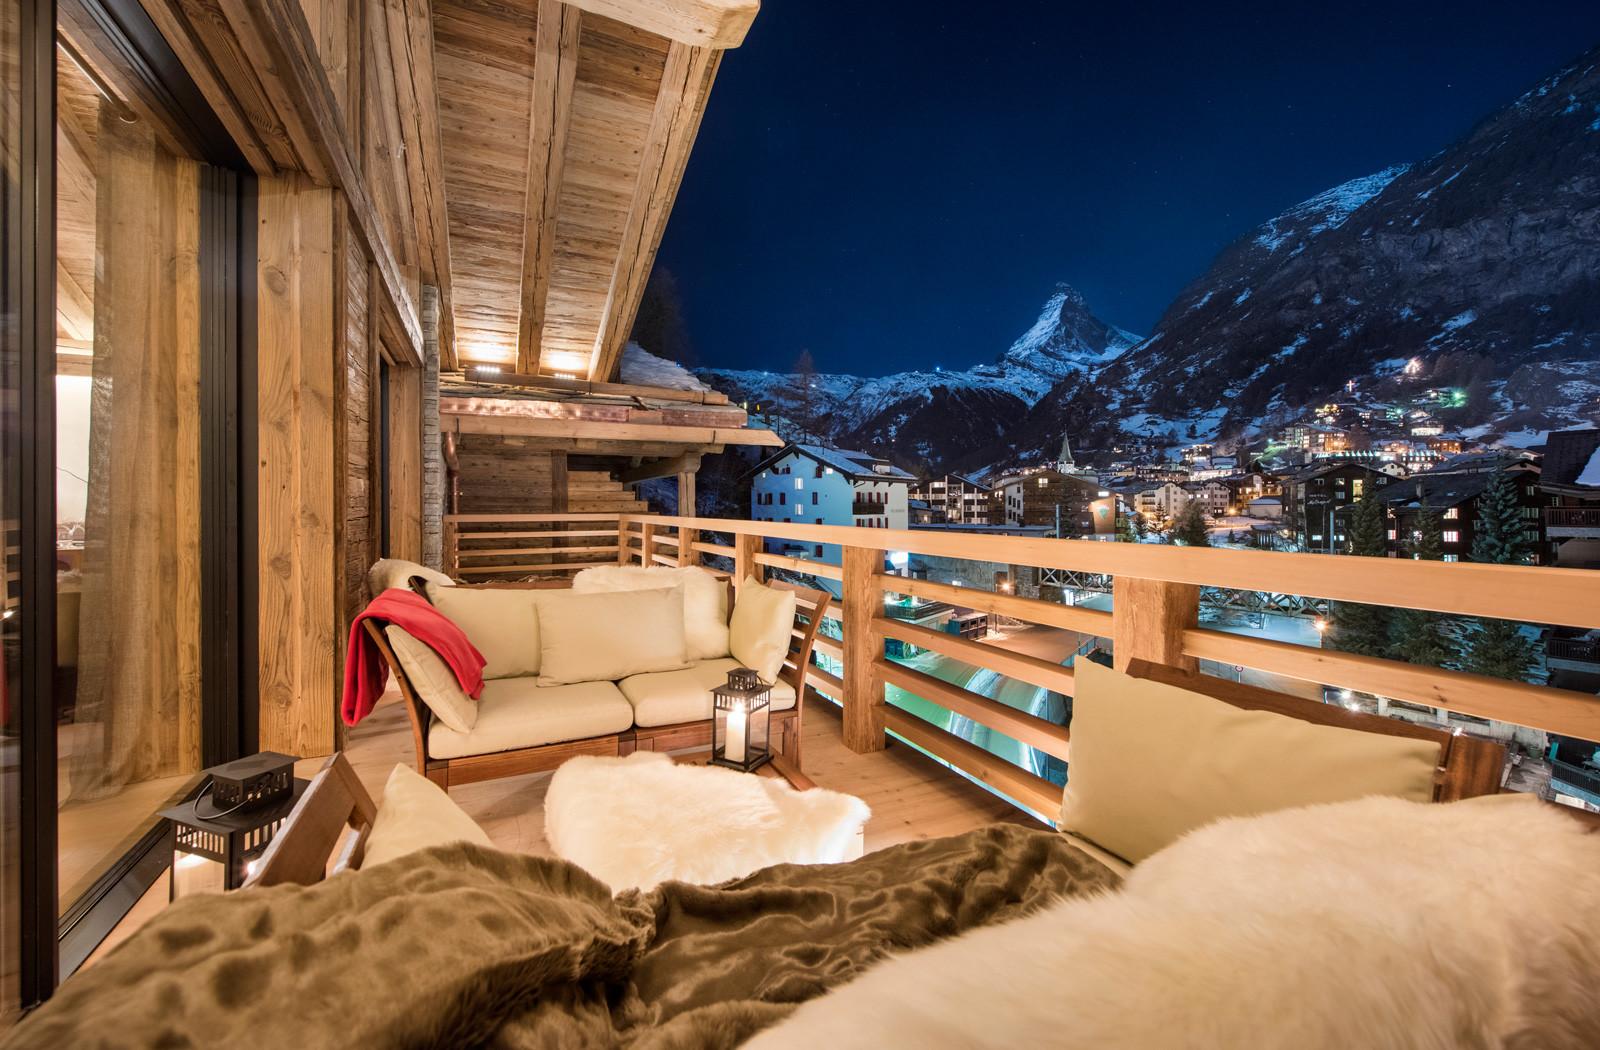 Kings-avenue-zermatt-snow-chalet-sauna-indoor-jacuzzi-private-spa-gym-06-4